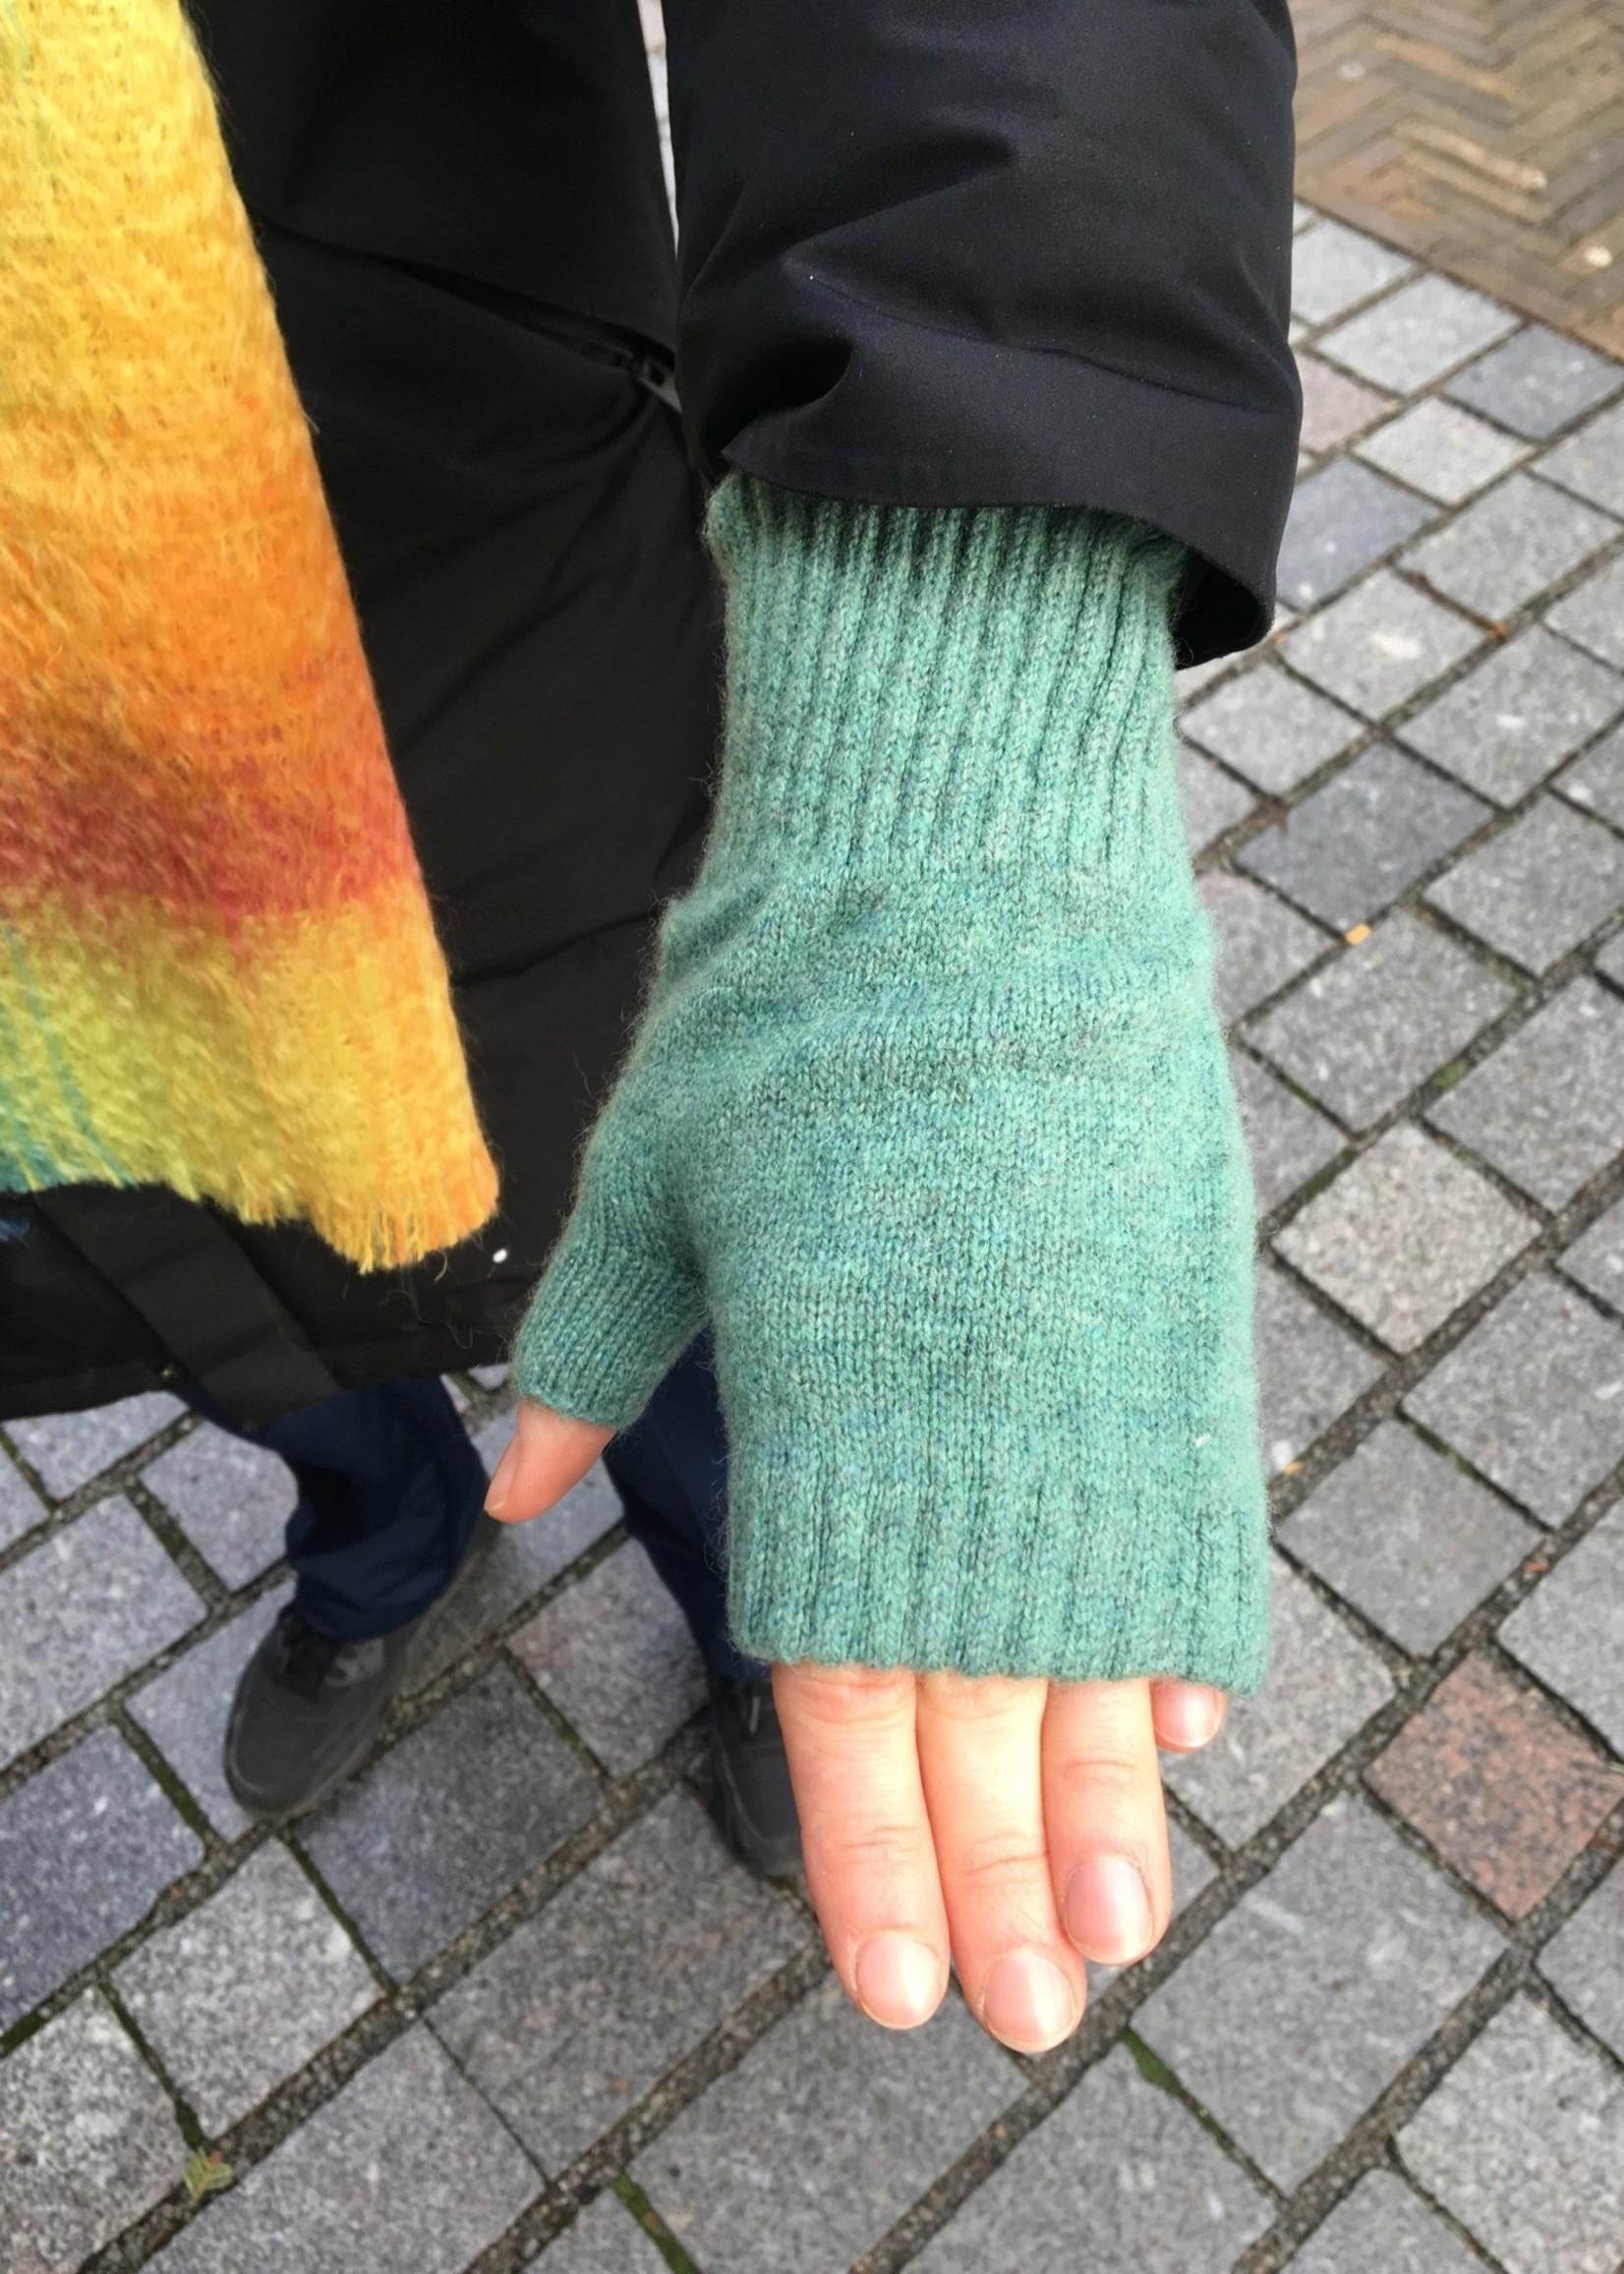 GreenGroveWeavers Handschoen KORT vingerloos  100% lamswol GROEN